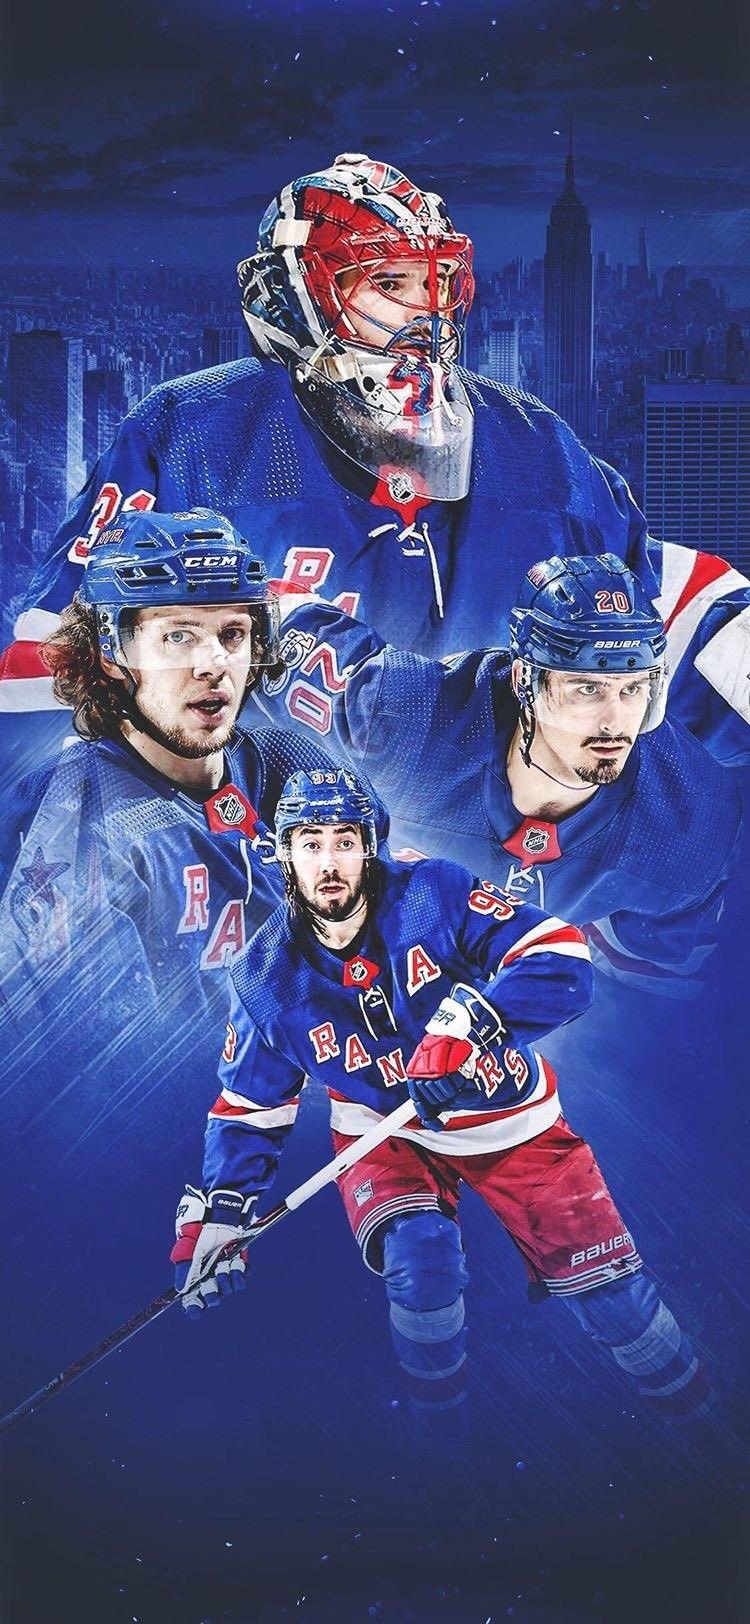 Pin By Joyce Prevot On Hockey New York Rangers Wallpapers Rangers Hockey New York Rangers